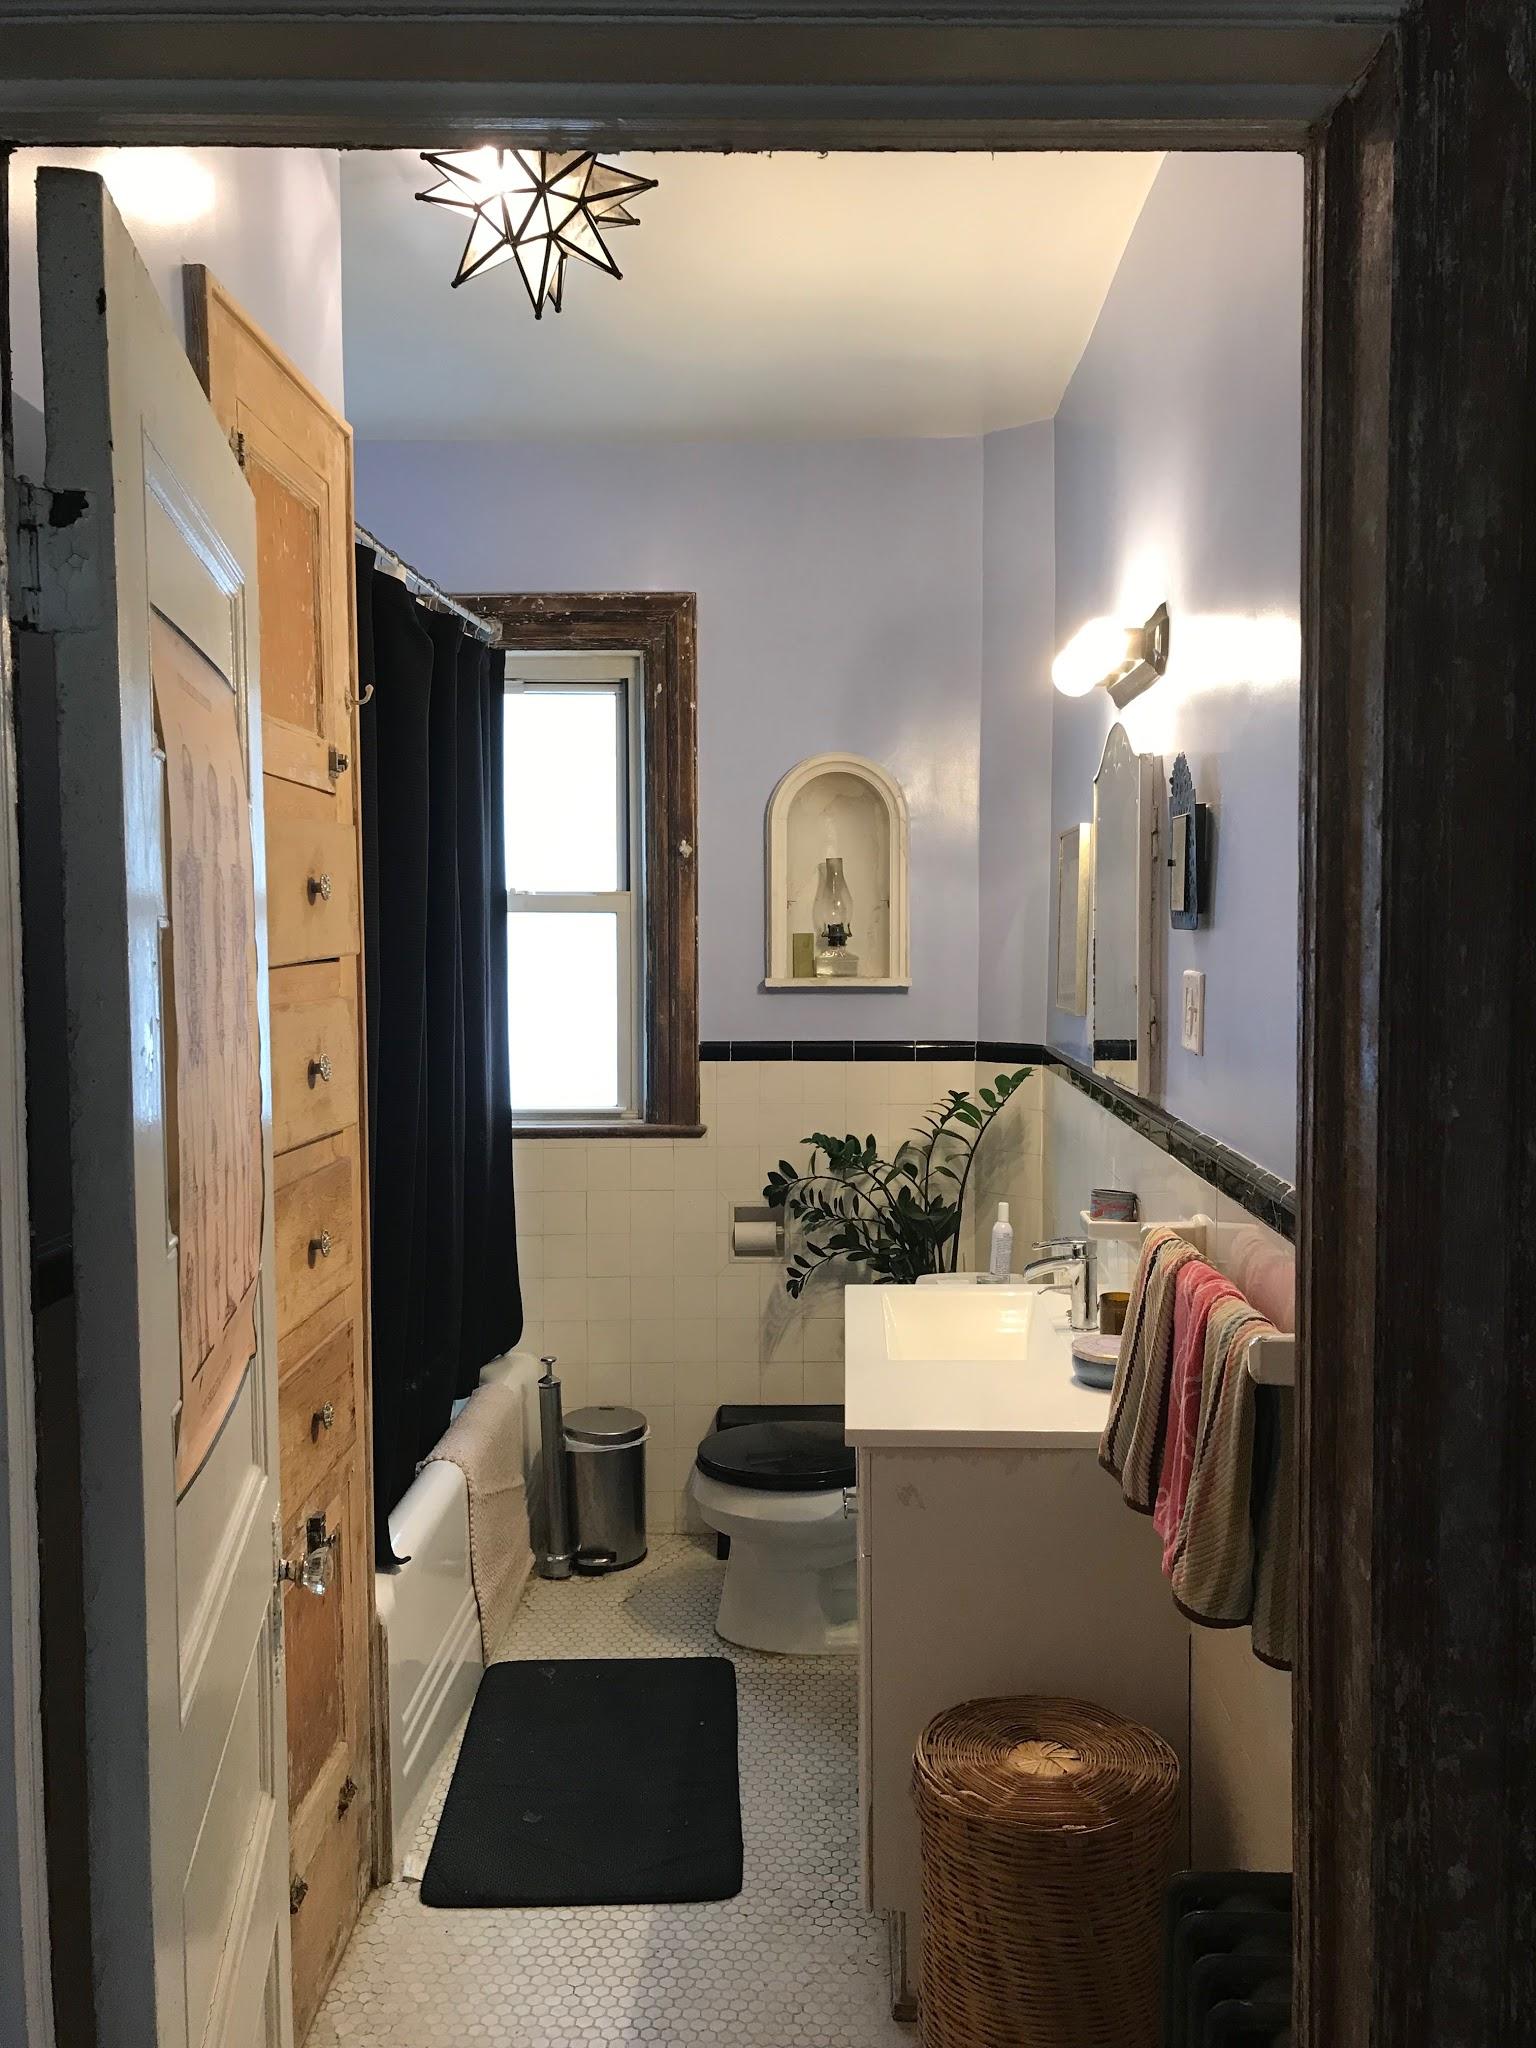 Black+white subway tile bathroom with full tub + lots of storage